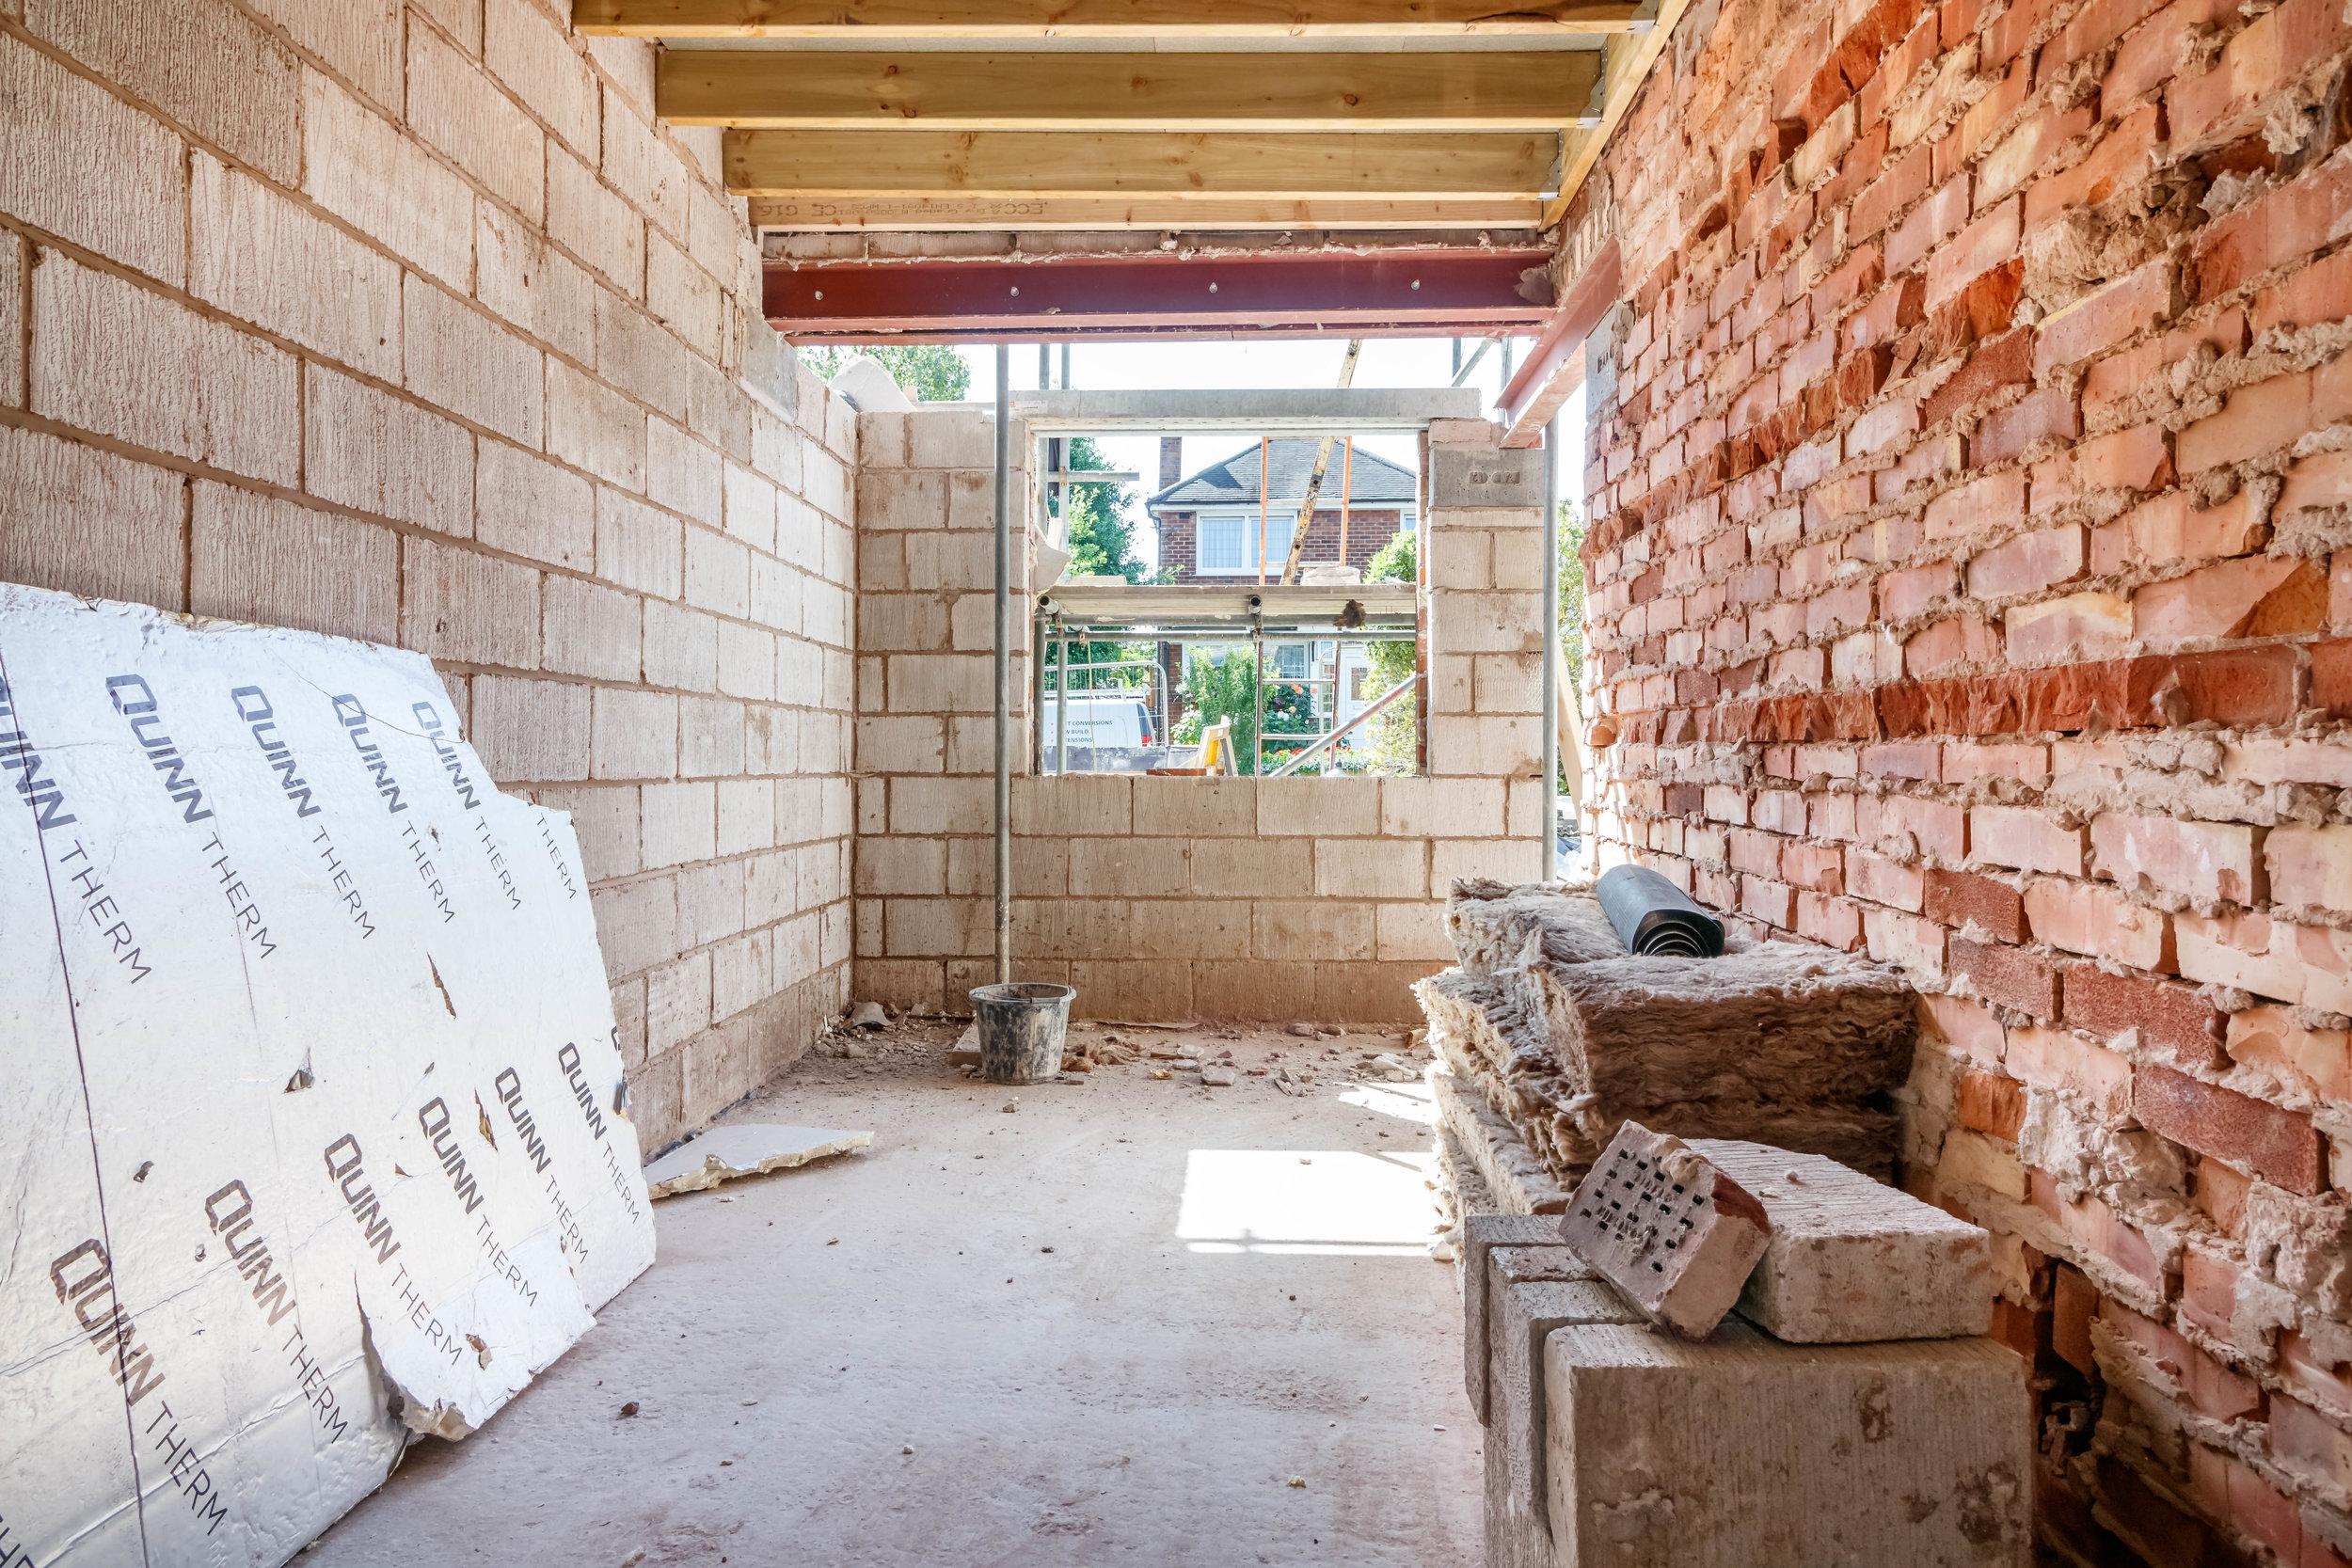 PropertyPhotographs-05157.jpg